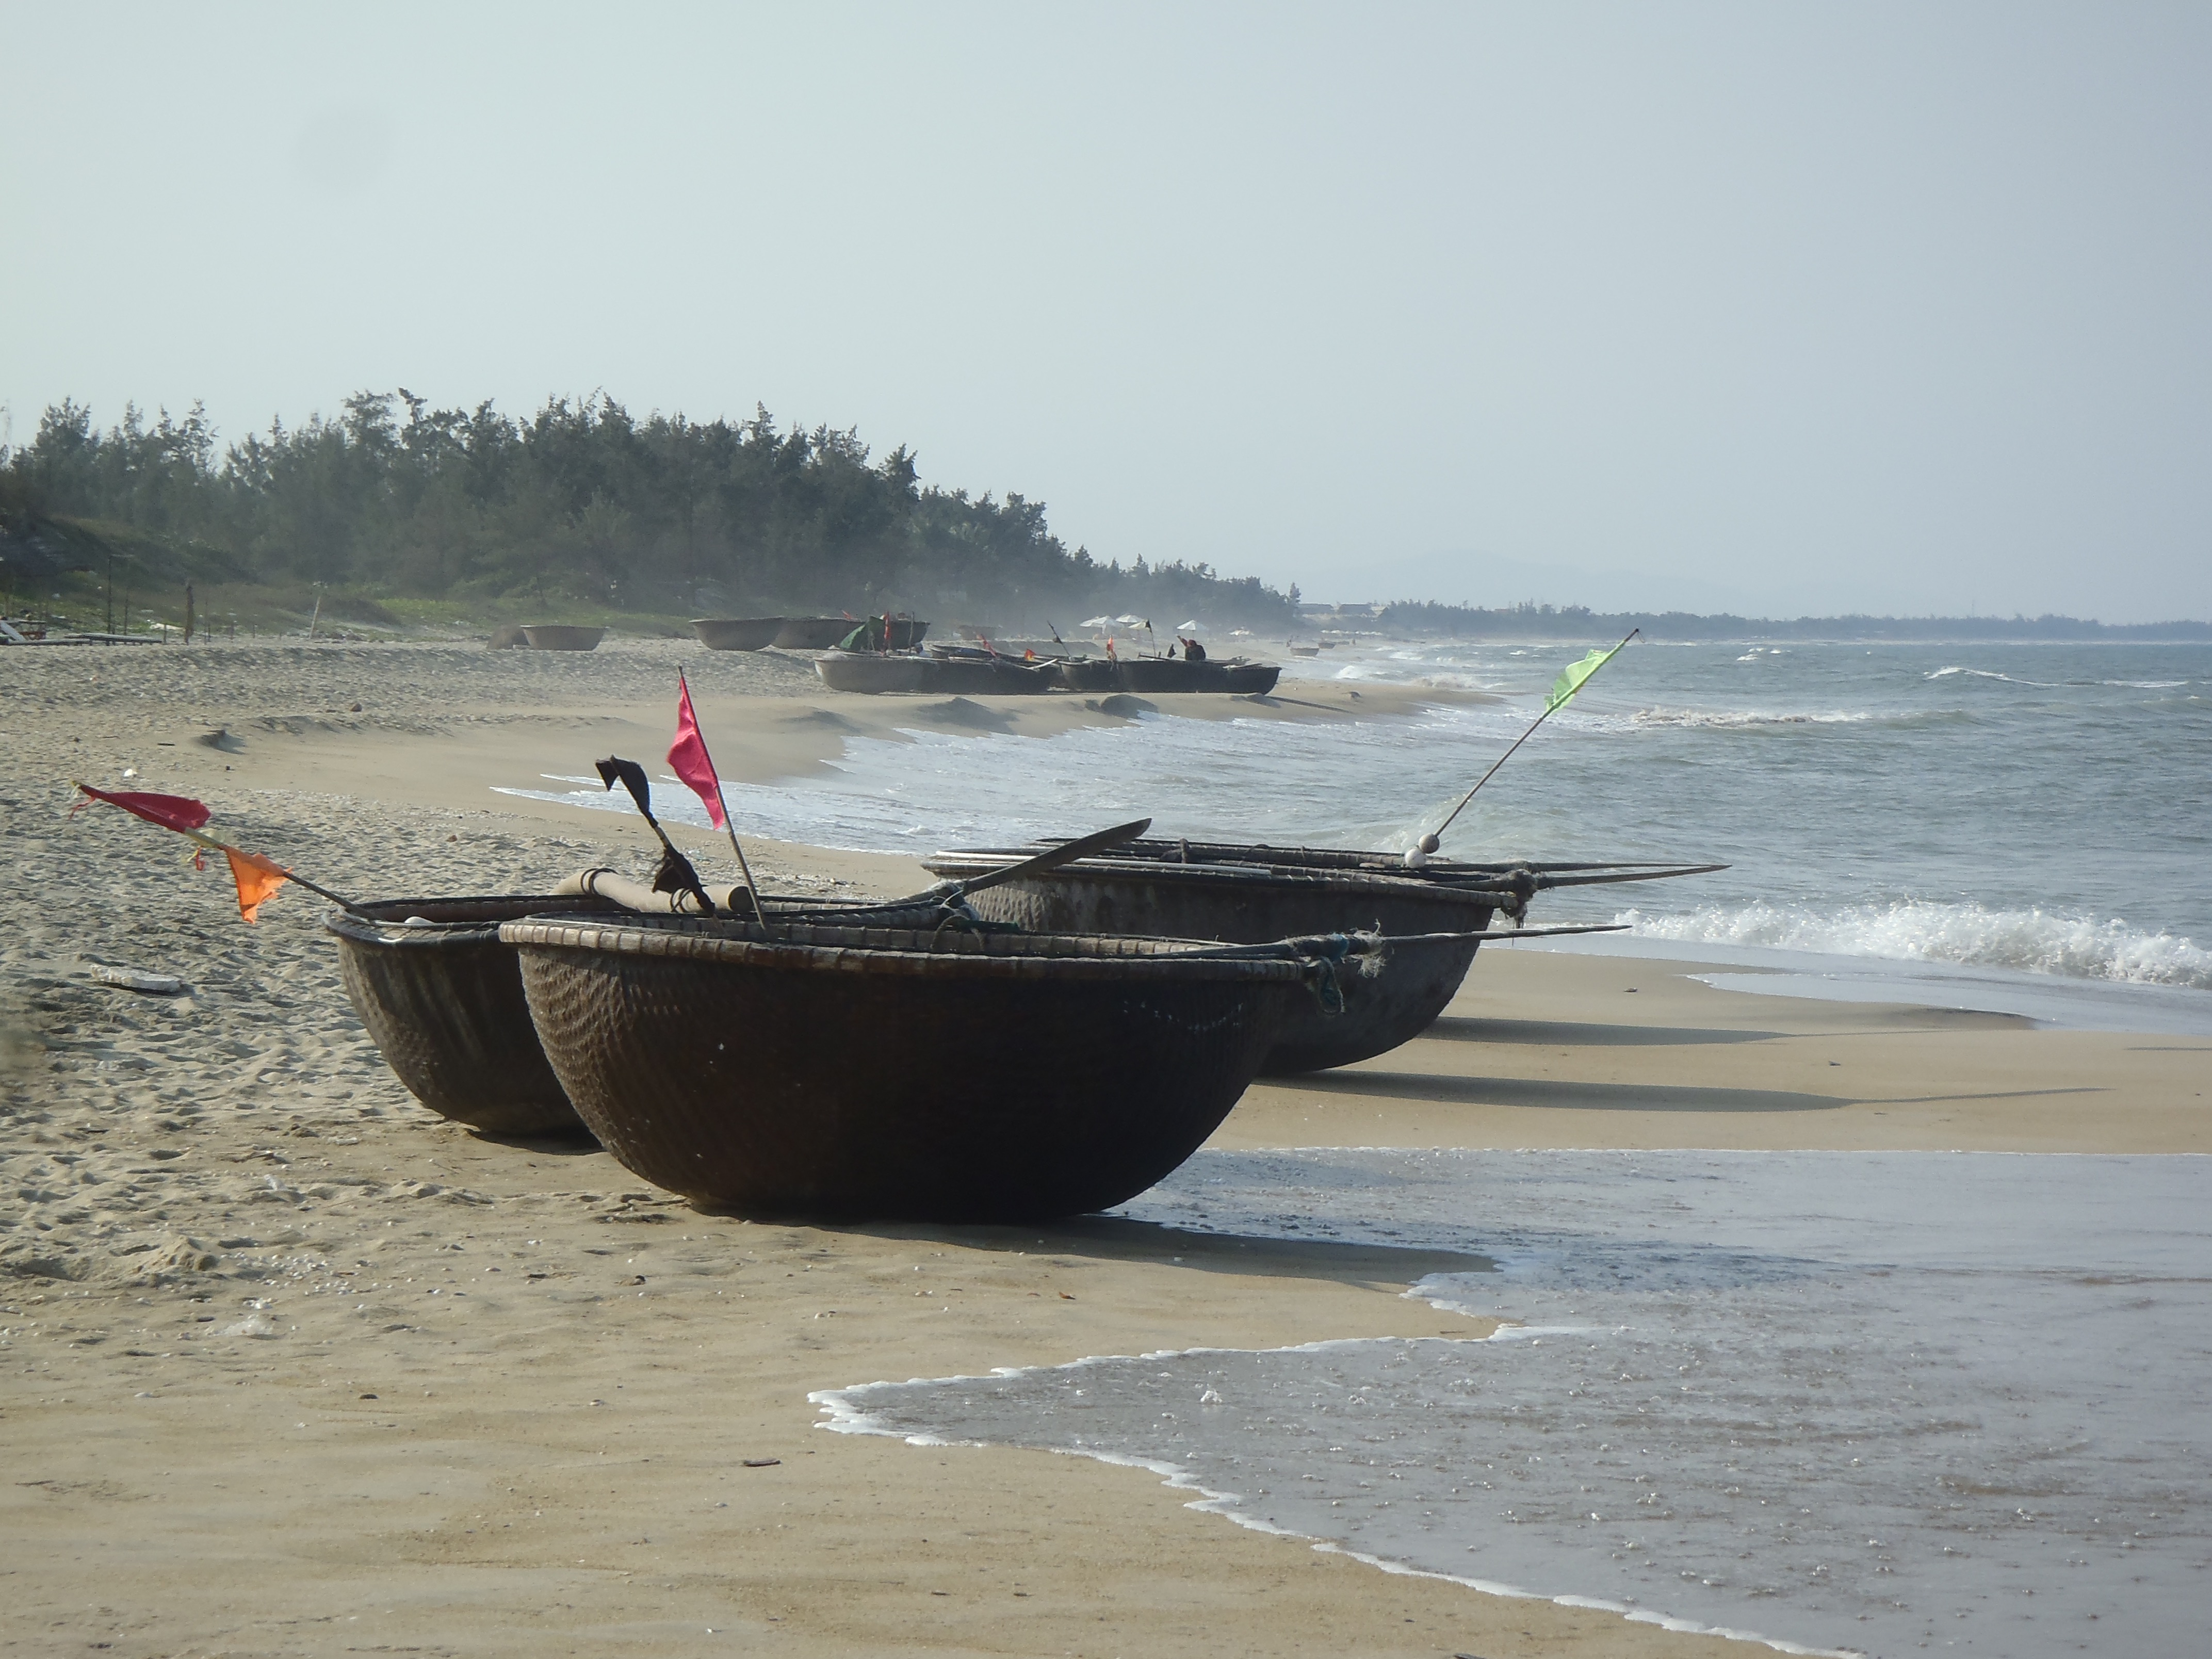 Fishing boats China Beach Hoi An